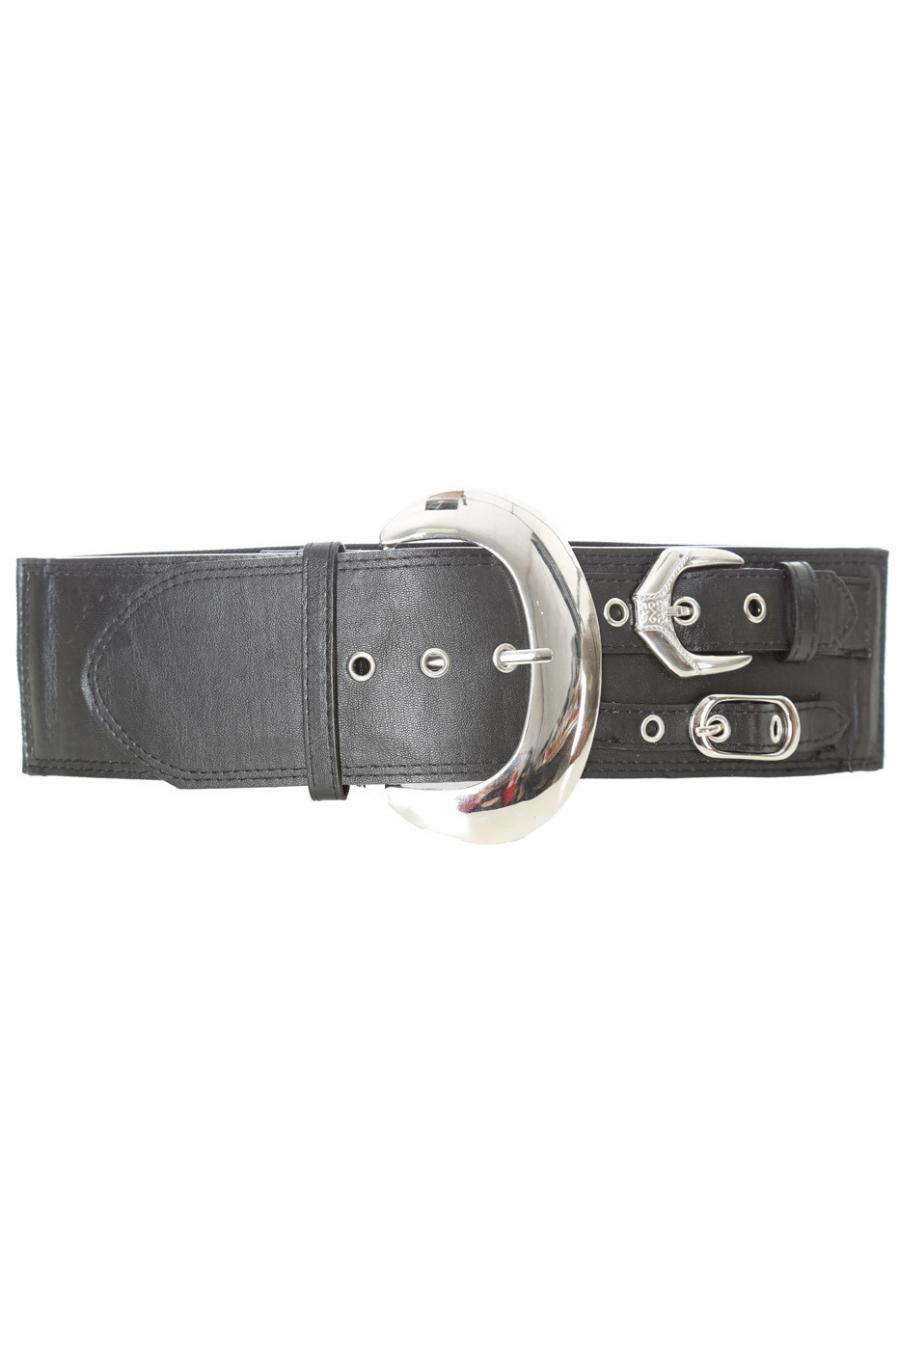 Zwarte elastische riem, grote ronde gesp. SG-0306